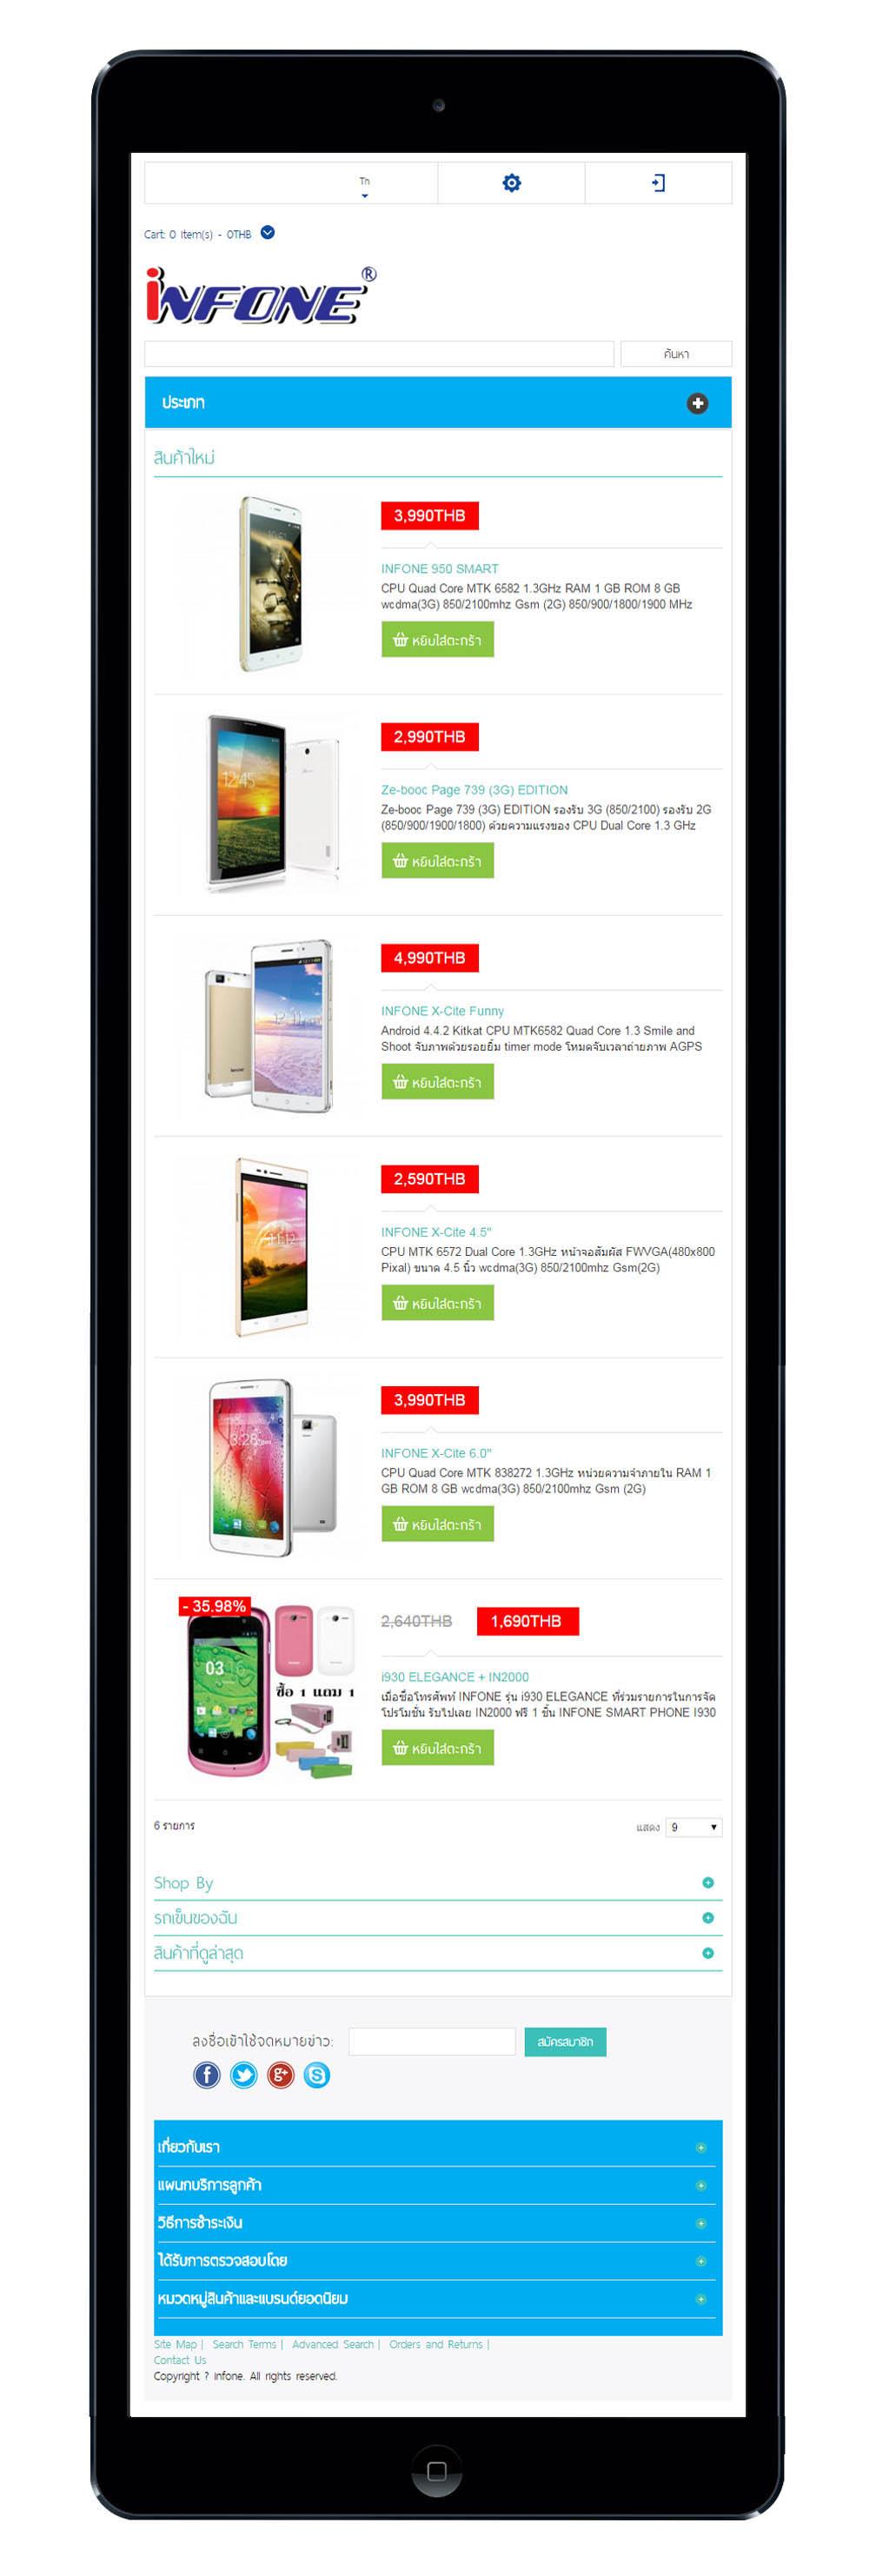 infone_iPad8922